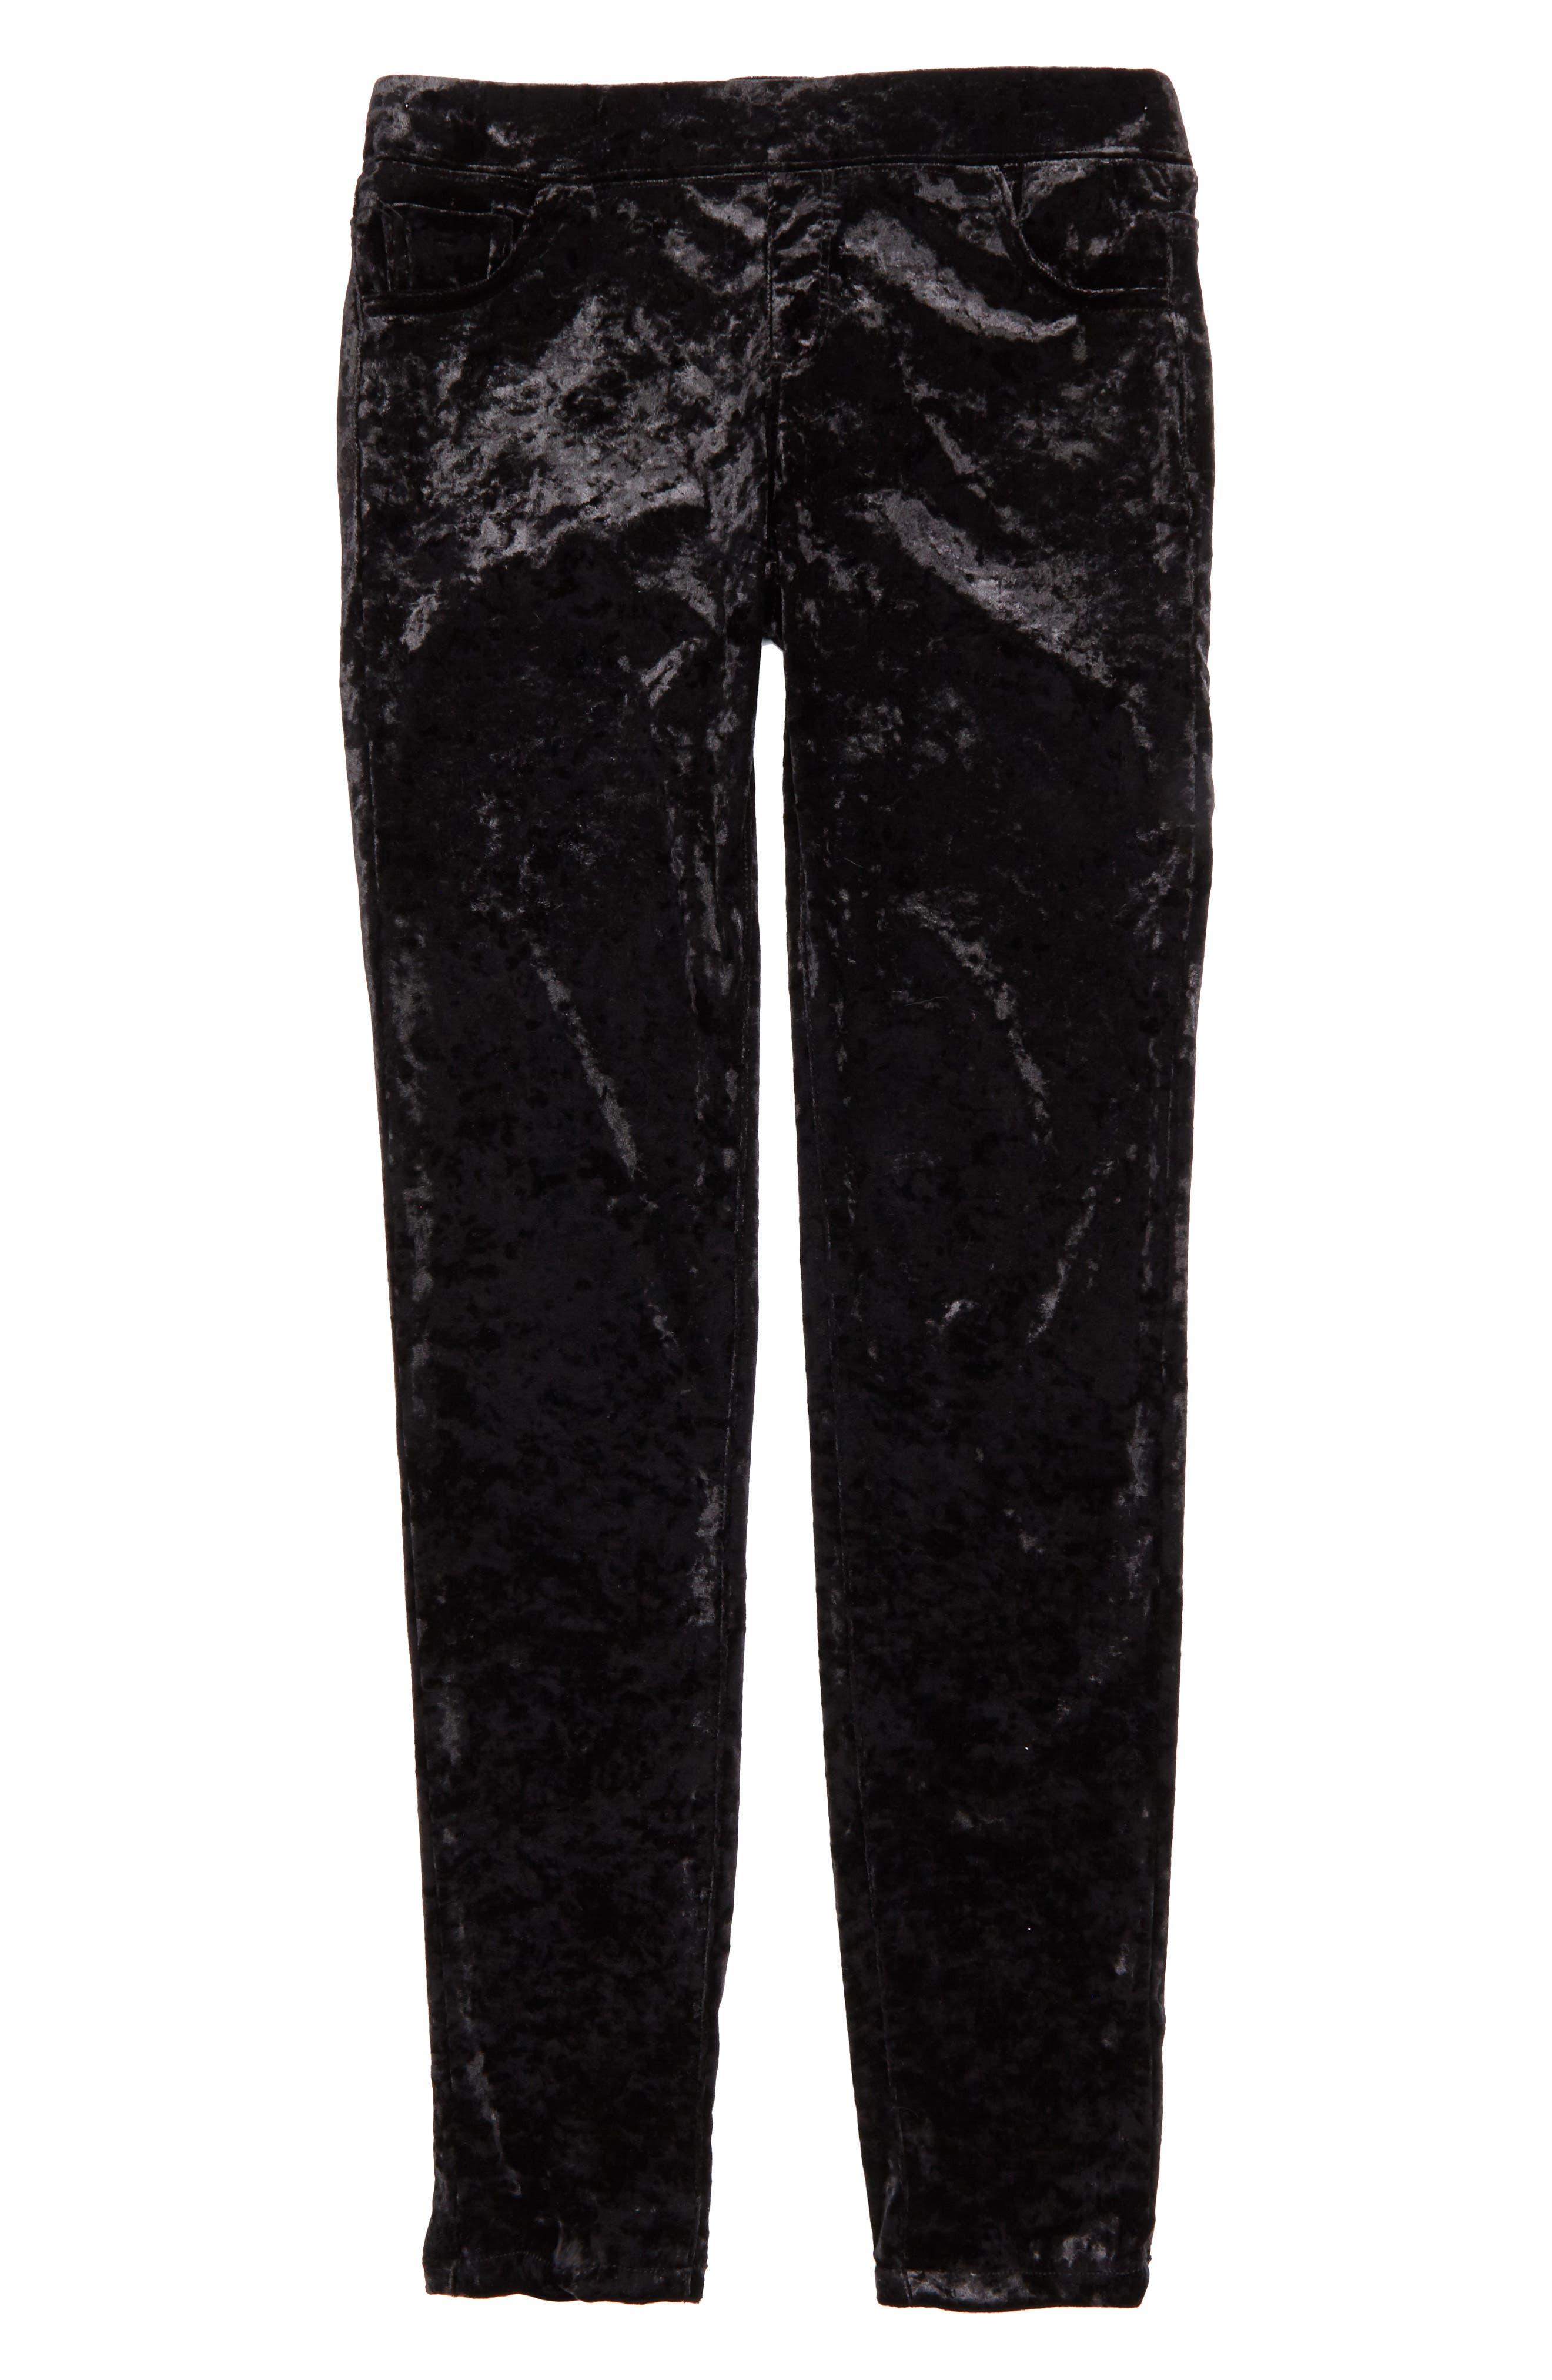 Crushed Velvet Skinny Pants,                             Main thumbnail 1, color,                             001